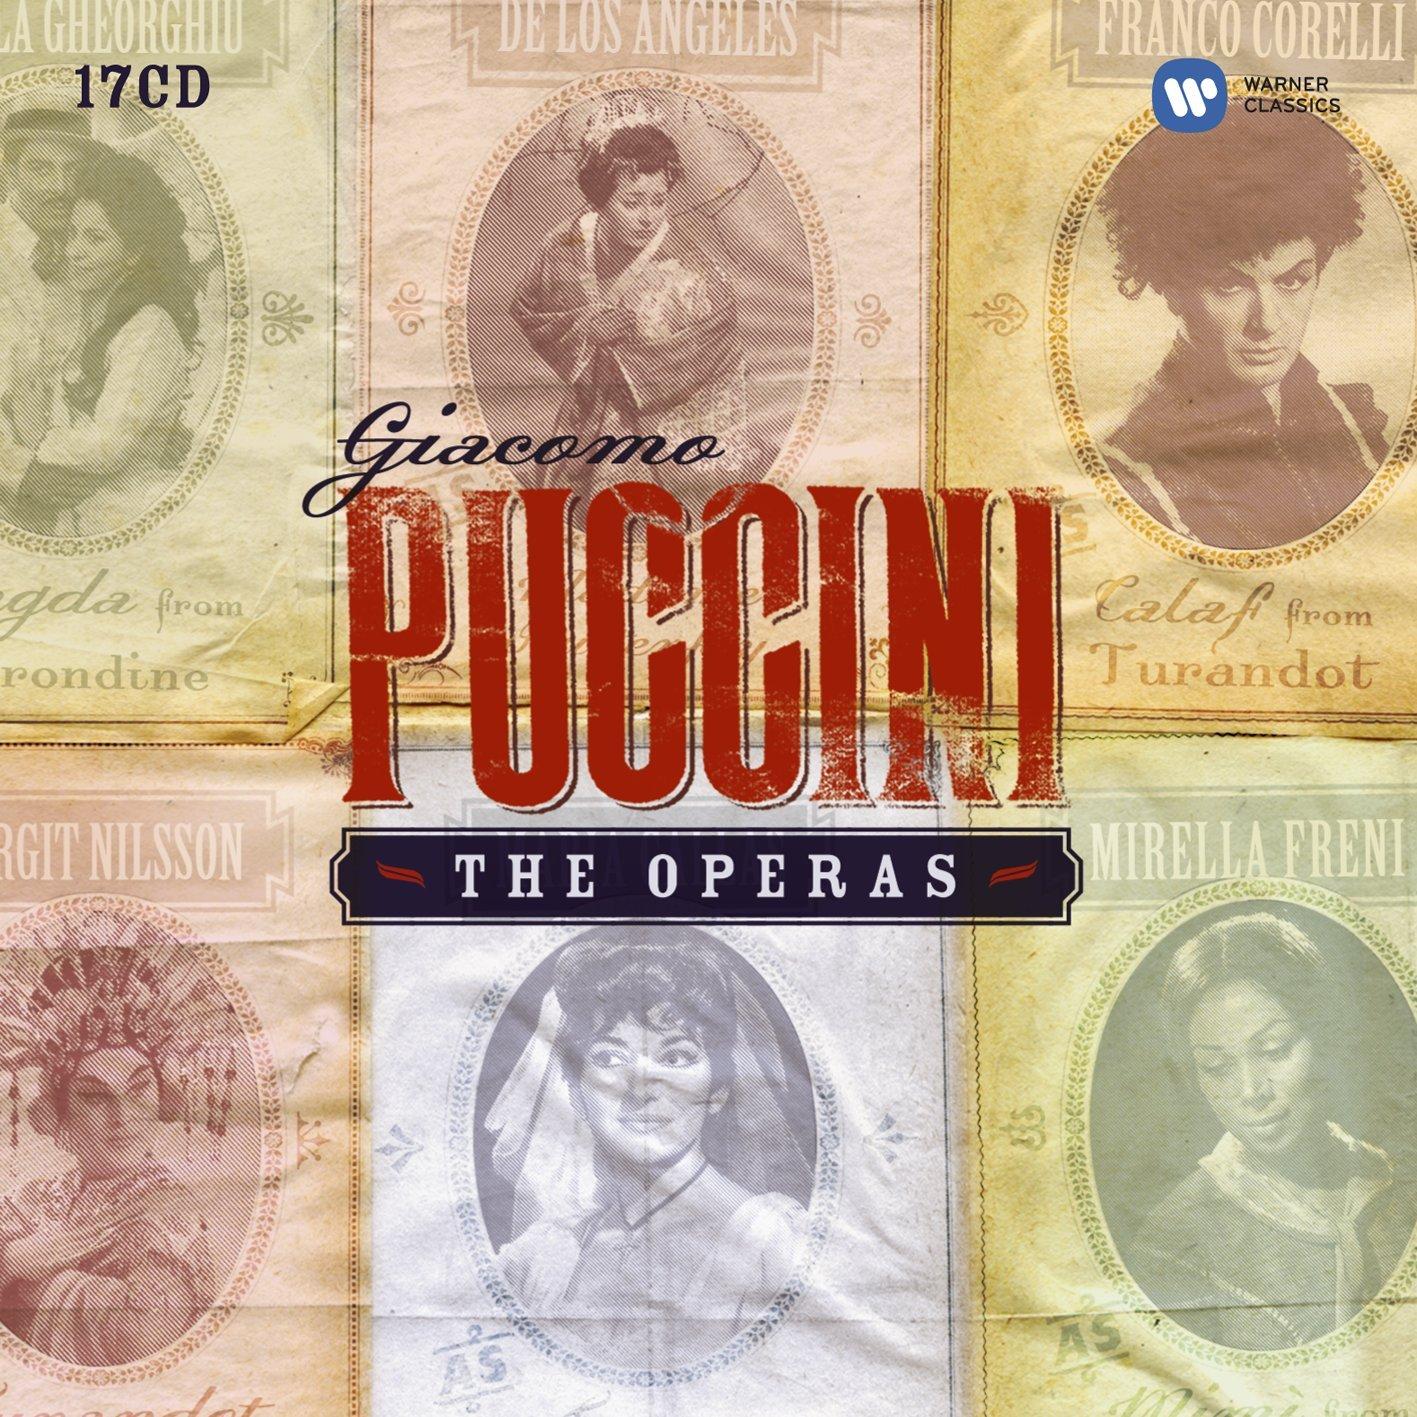 Puccini-La Bohème - Page 2 81tLa4YrLiL._SL1417_